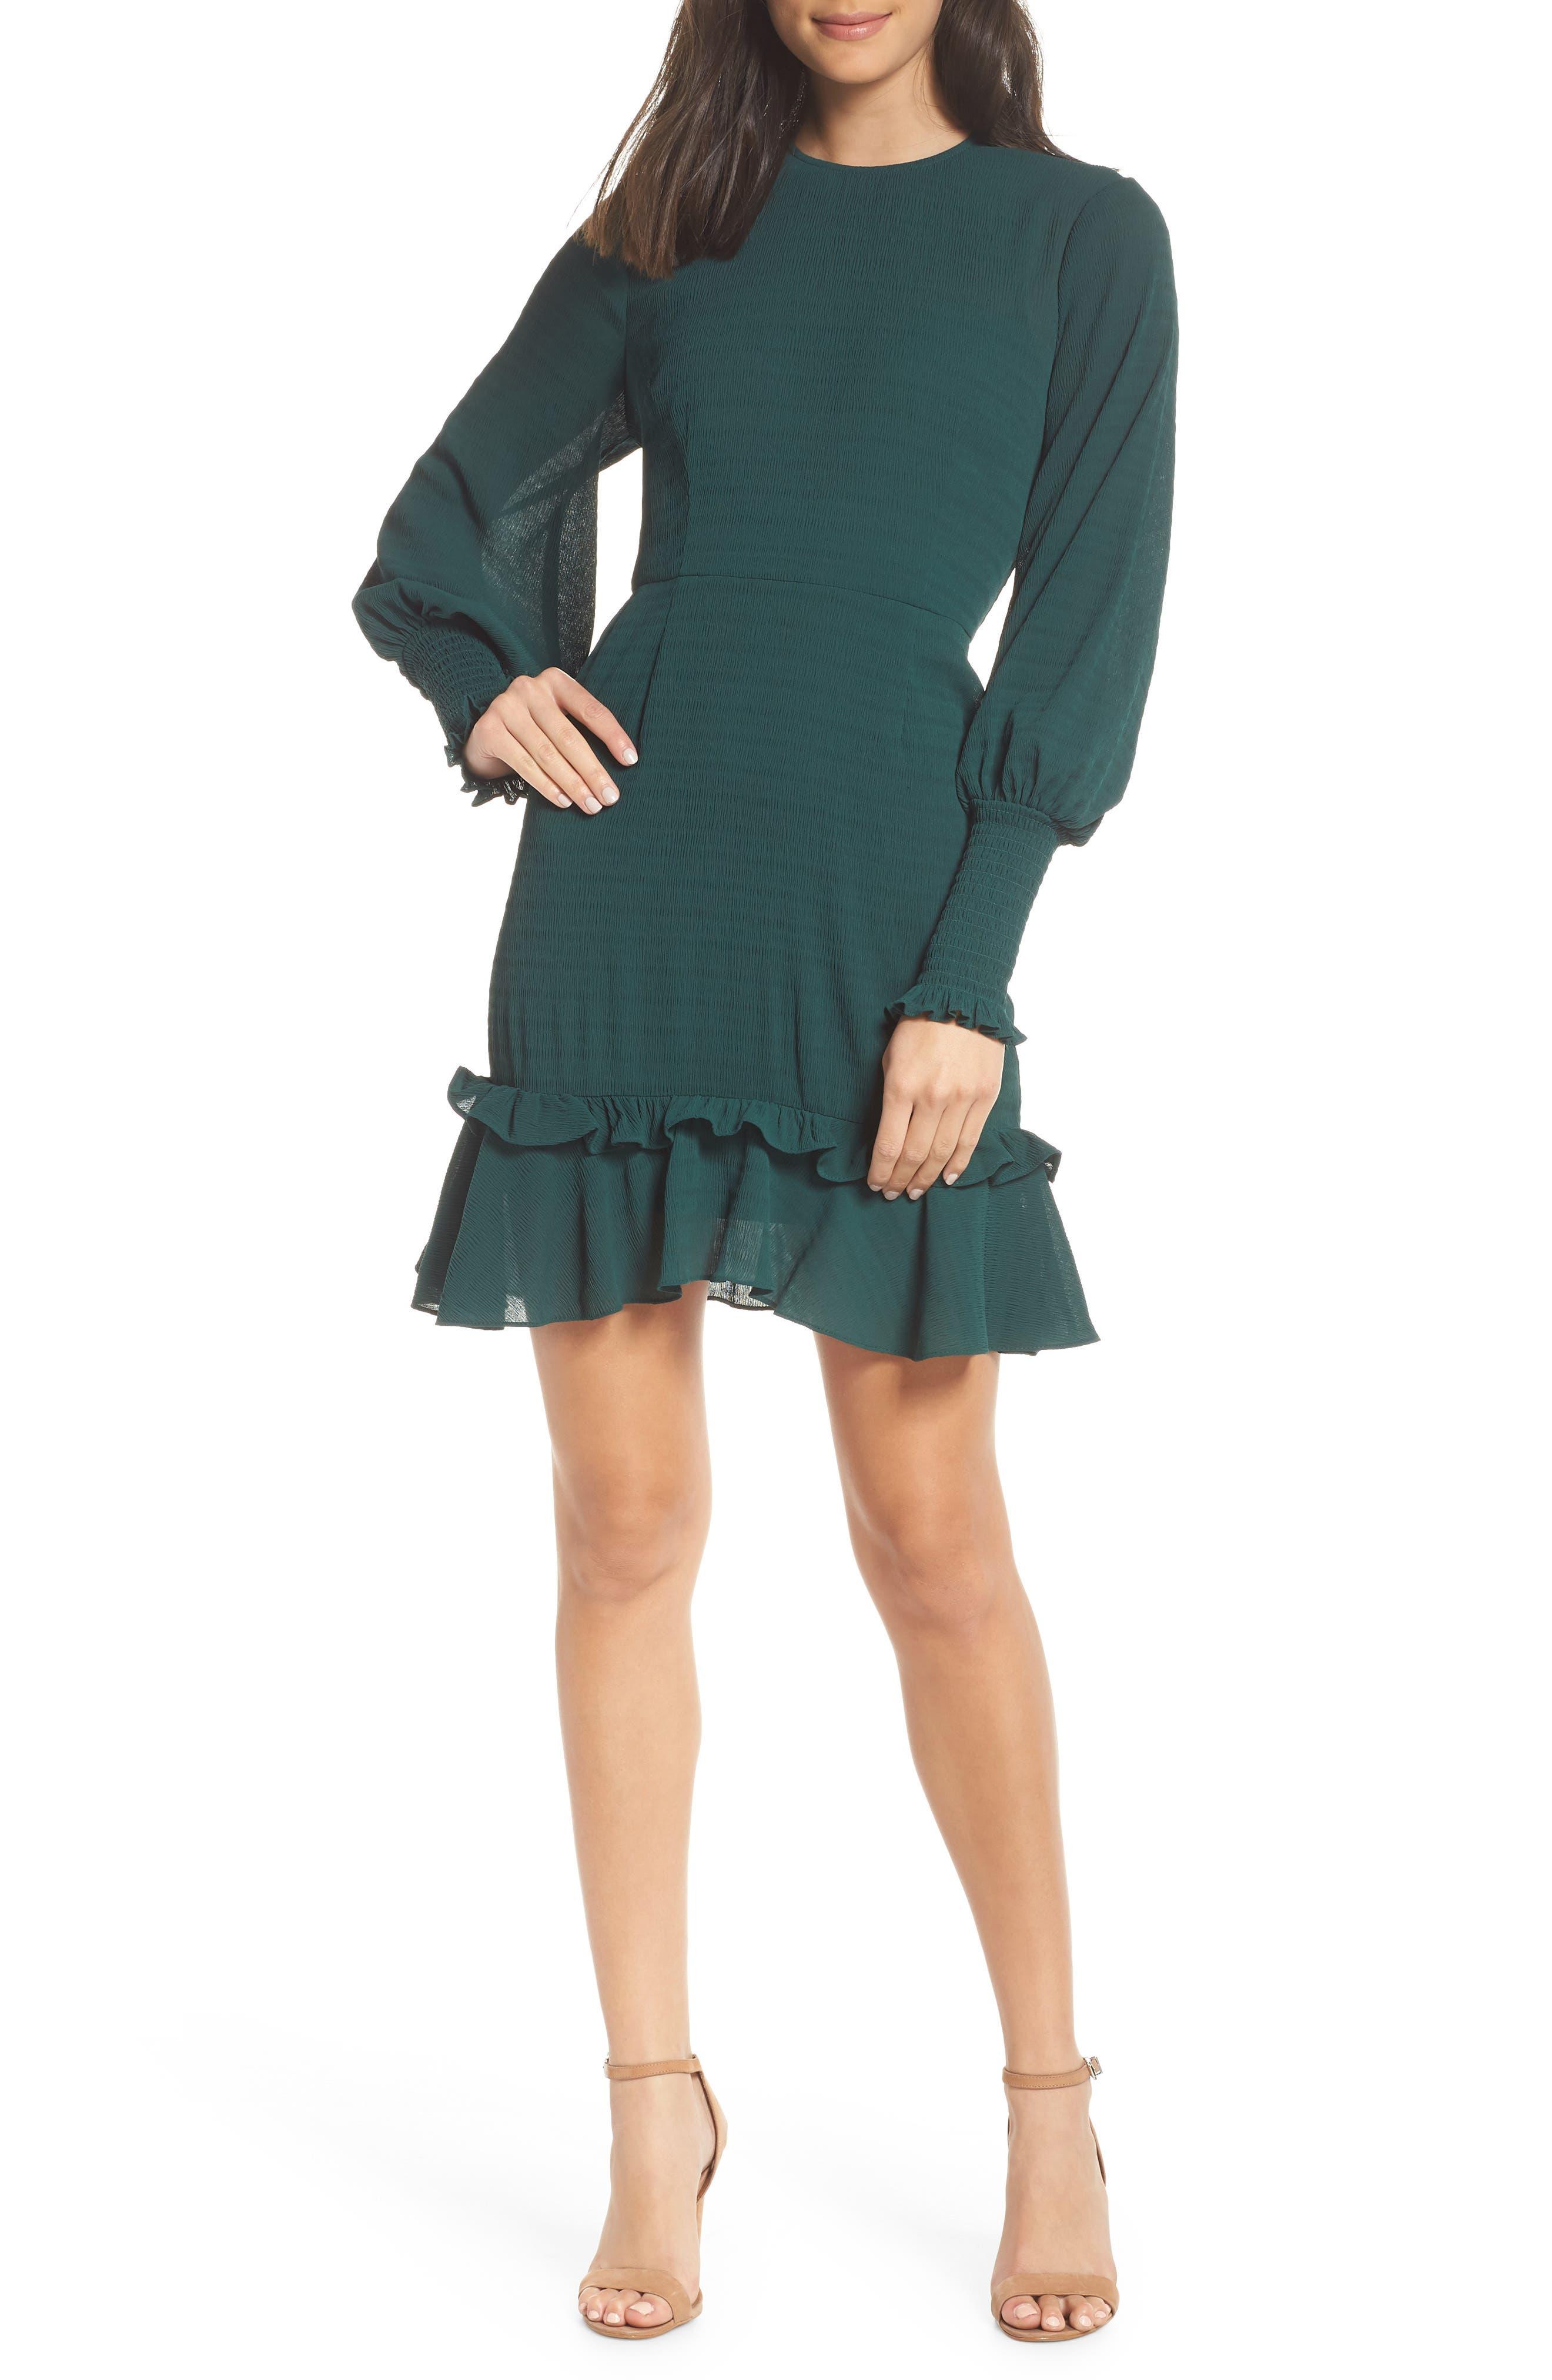 CHELSEA28 Ruffle A-Line Dress, Main, color, 301